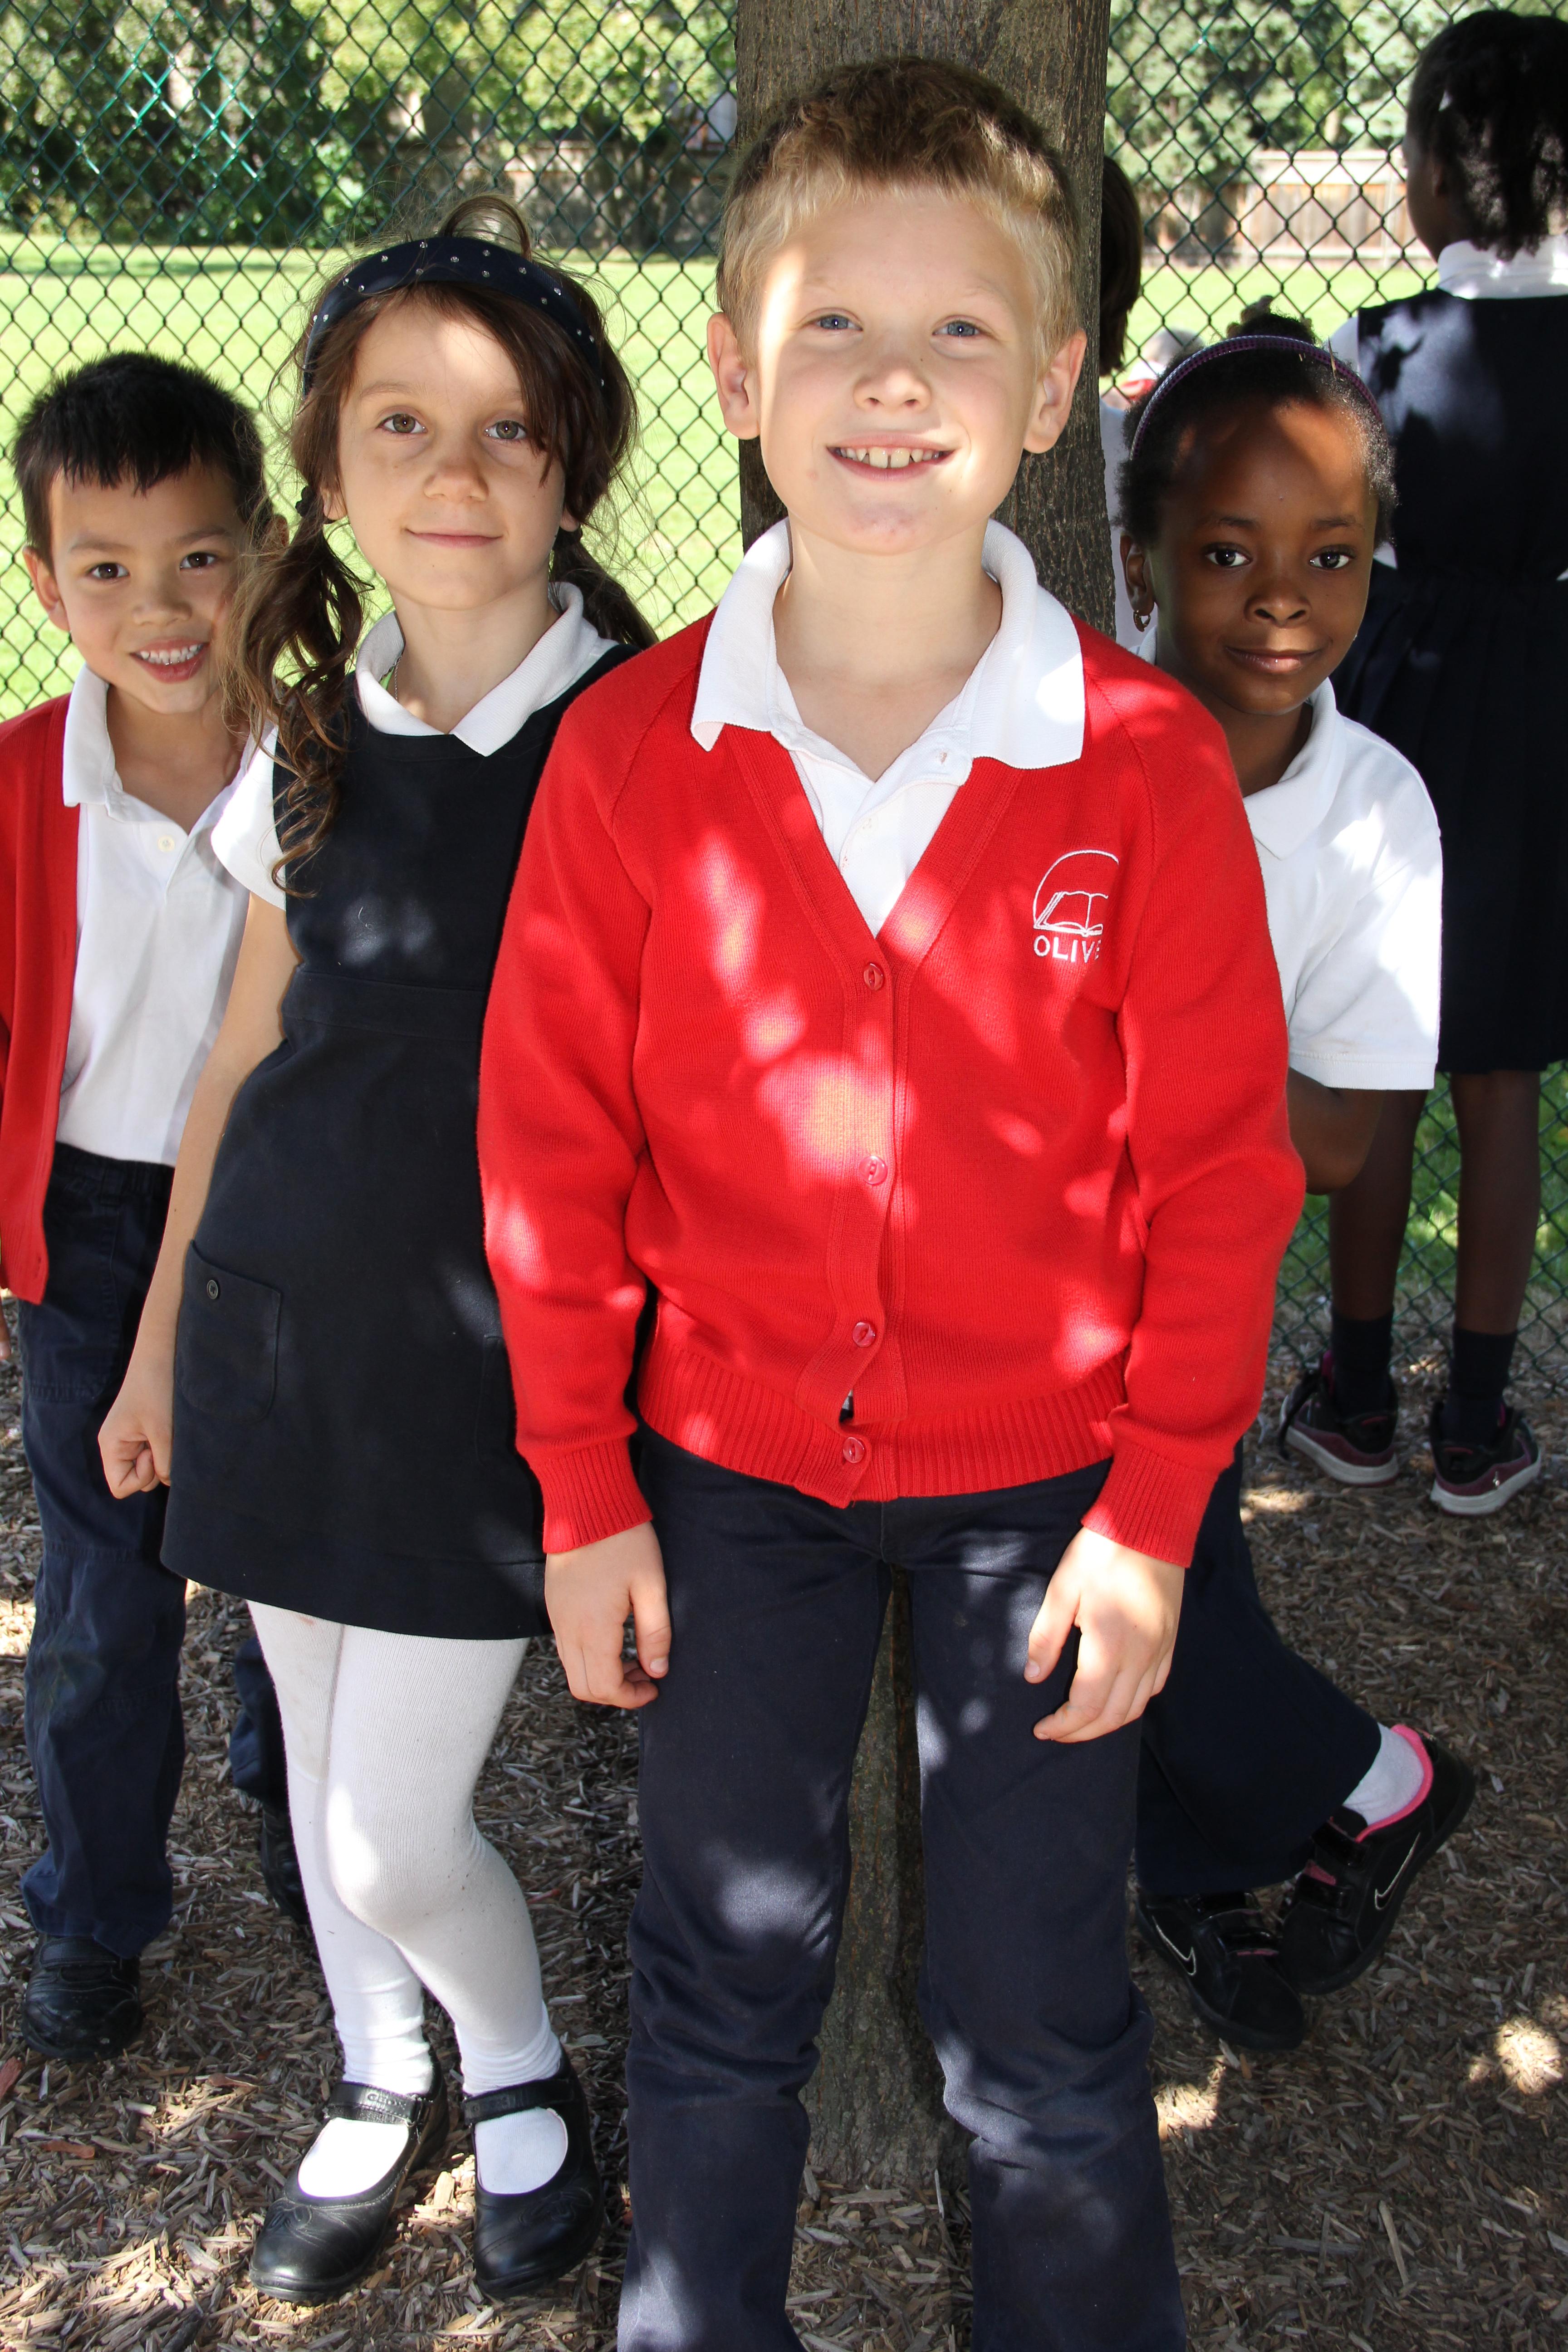 Olivet School Admissions